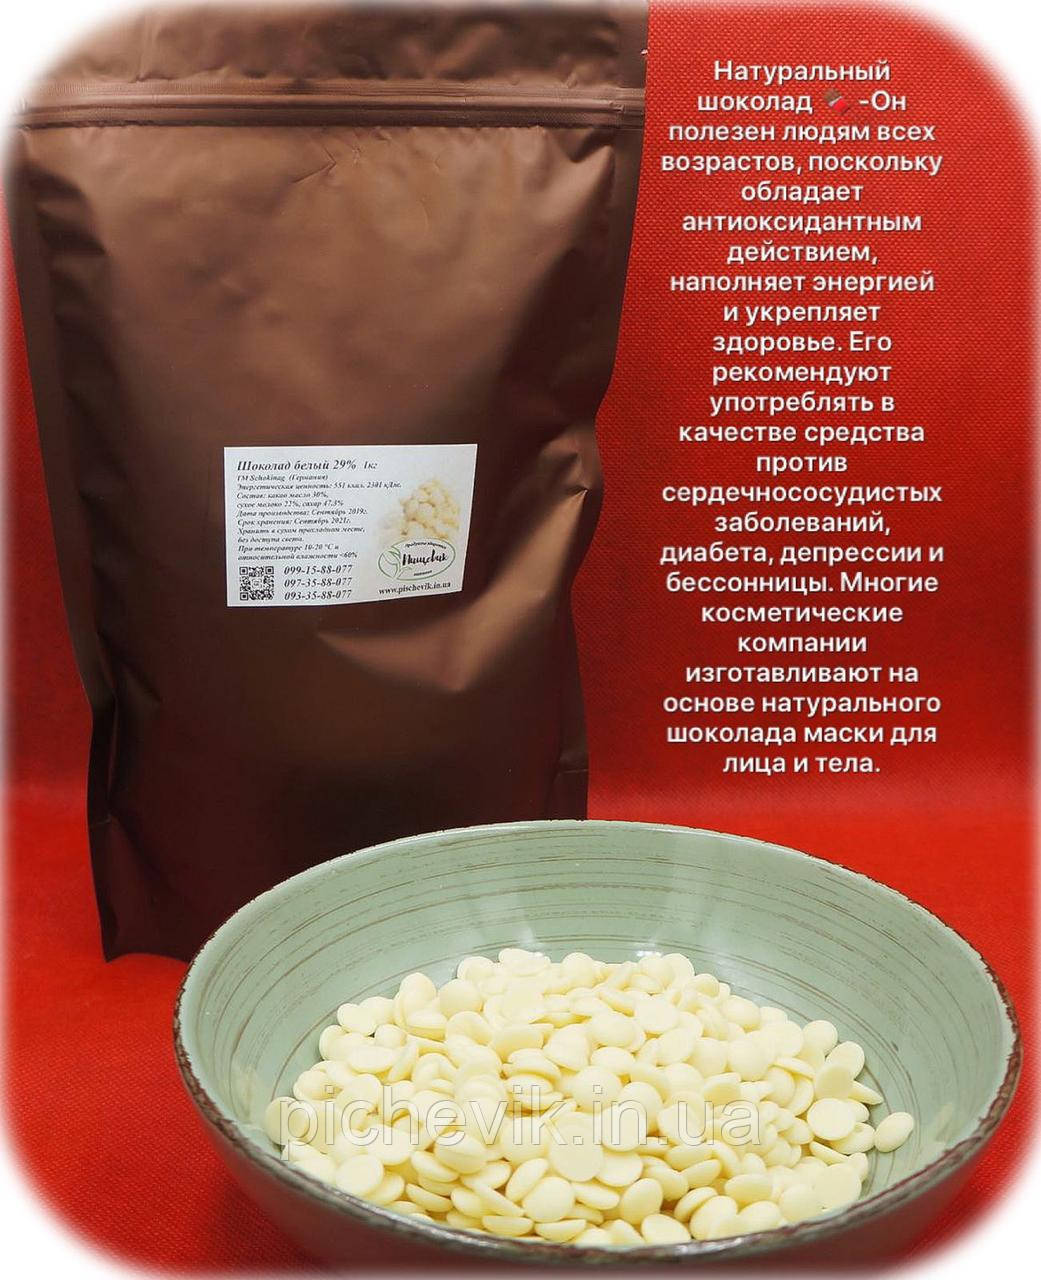 Шоколад белый 29% ТМ Schokinag (Германия) Вес: 250 гр